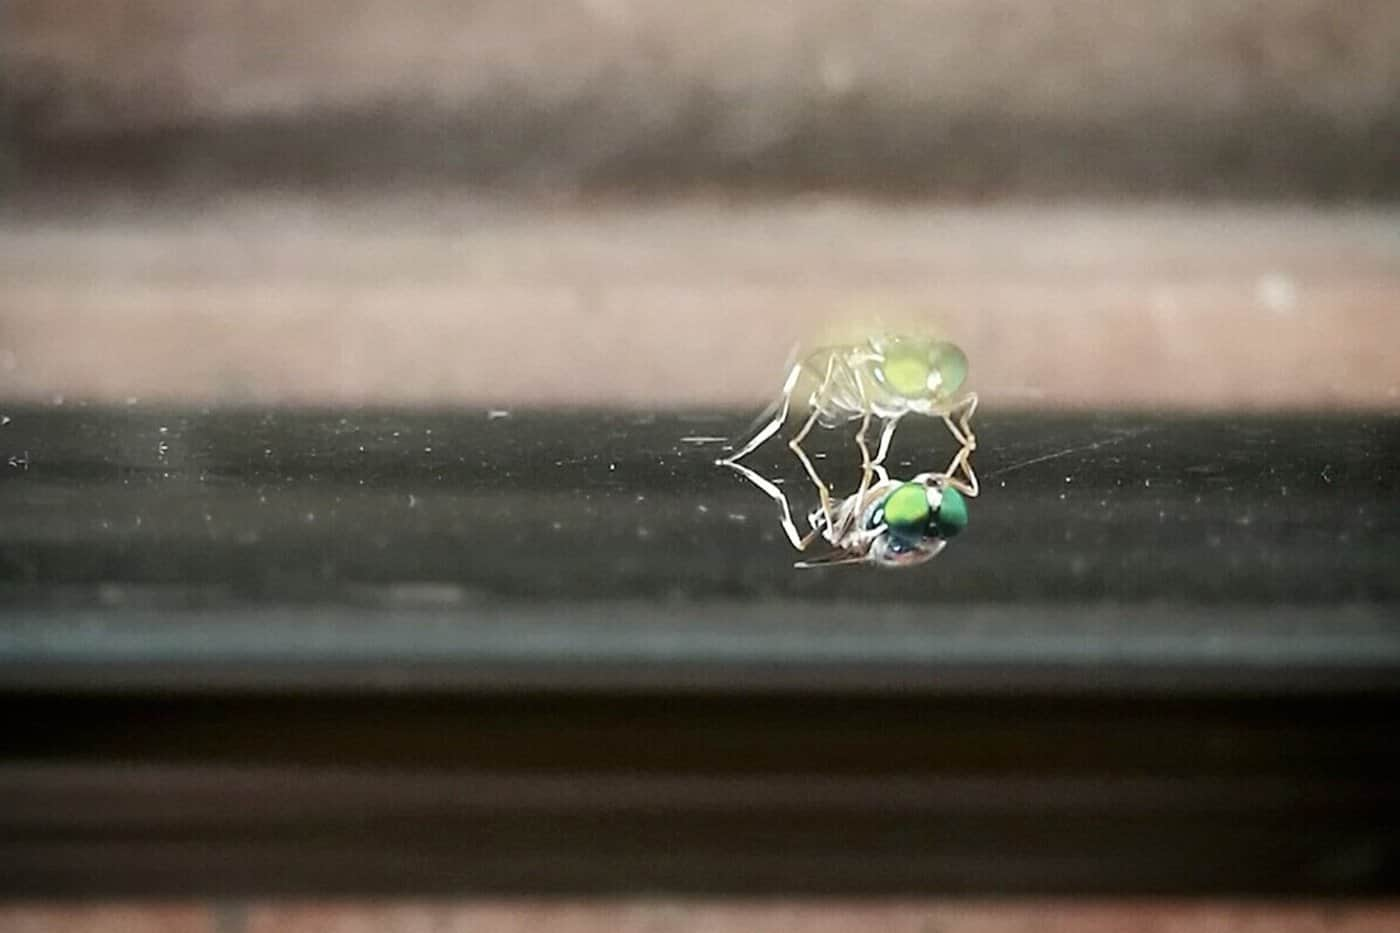 Foto tomada en la ventana de mi estudio de diseño. Rebeca Chang.